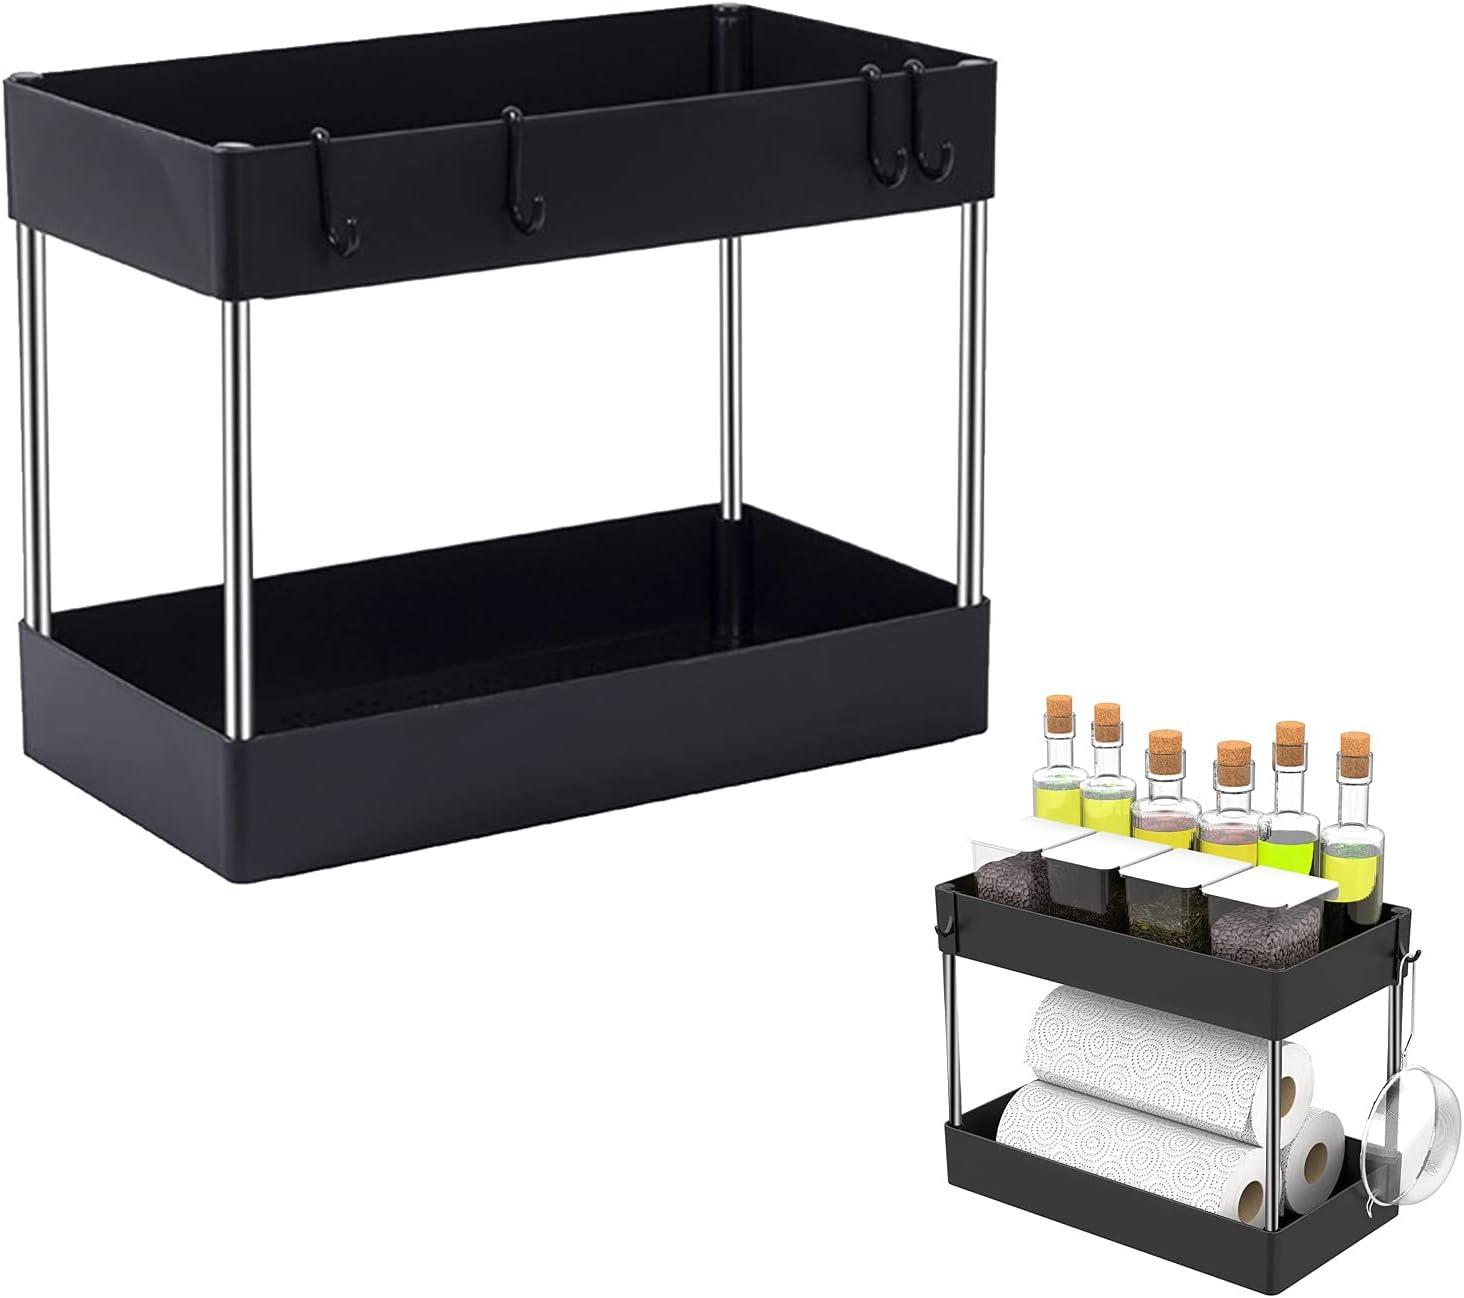 ORIJOYNA Colorado Springs Mall Standing Shelf Storage Cart - Dual Today's only Shelves Duty S Light